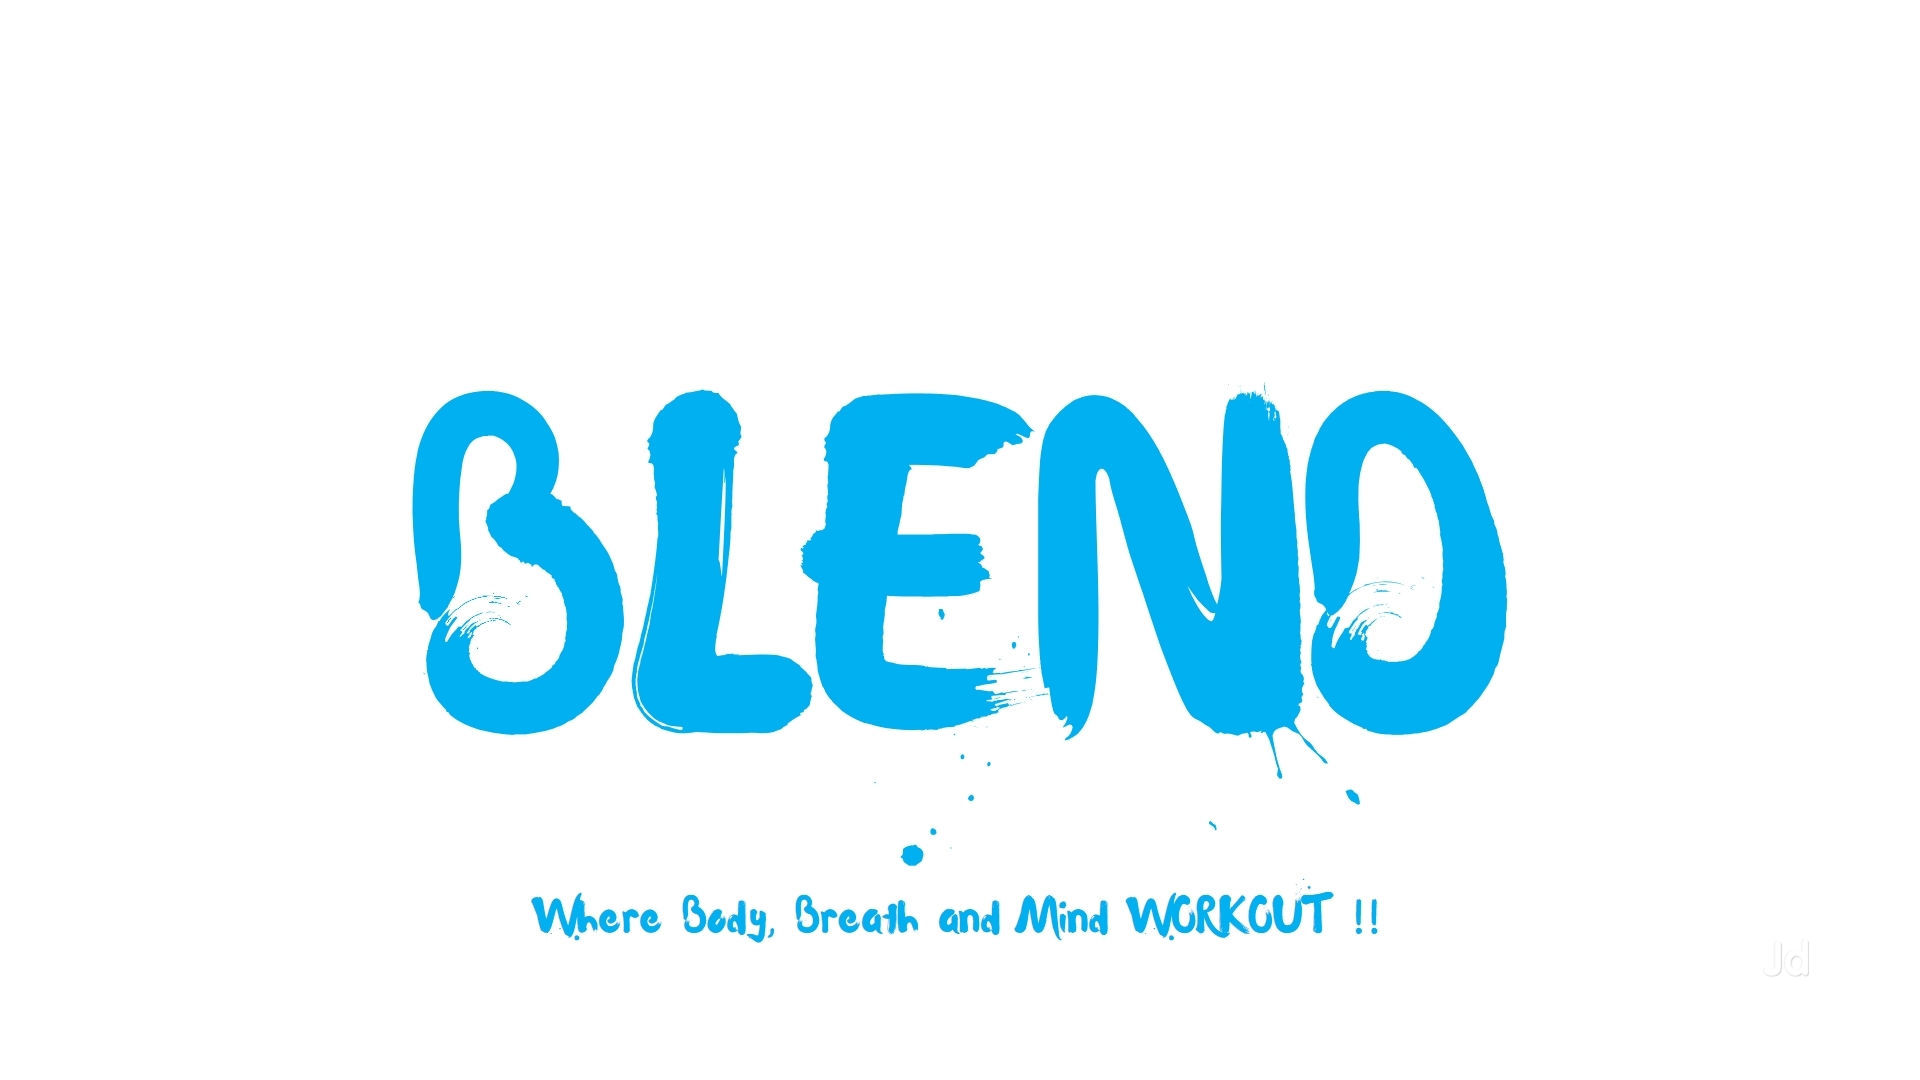 Blend yoga and aerobics centre photos a rao nagar hyderabad yoga classes - Aerobic  Center Logo - Aerobic Center PNG